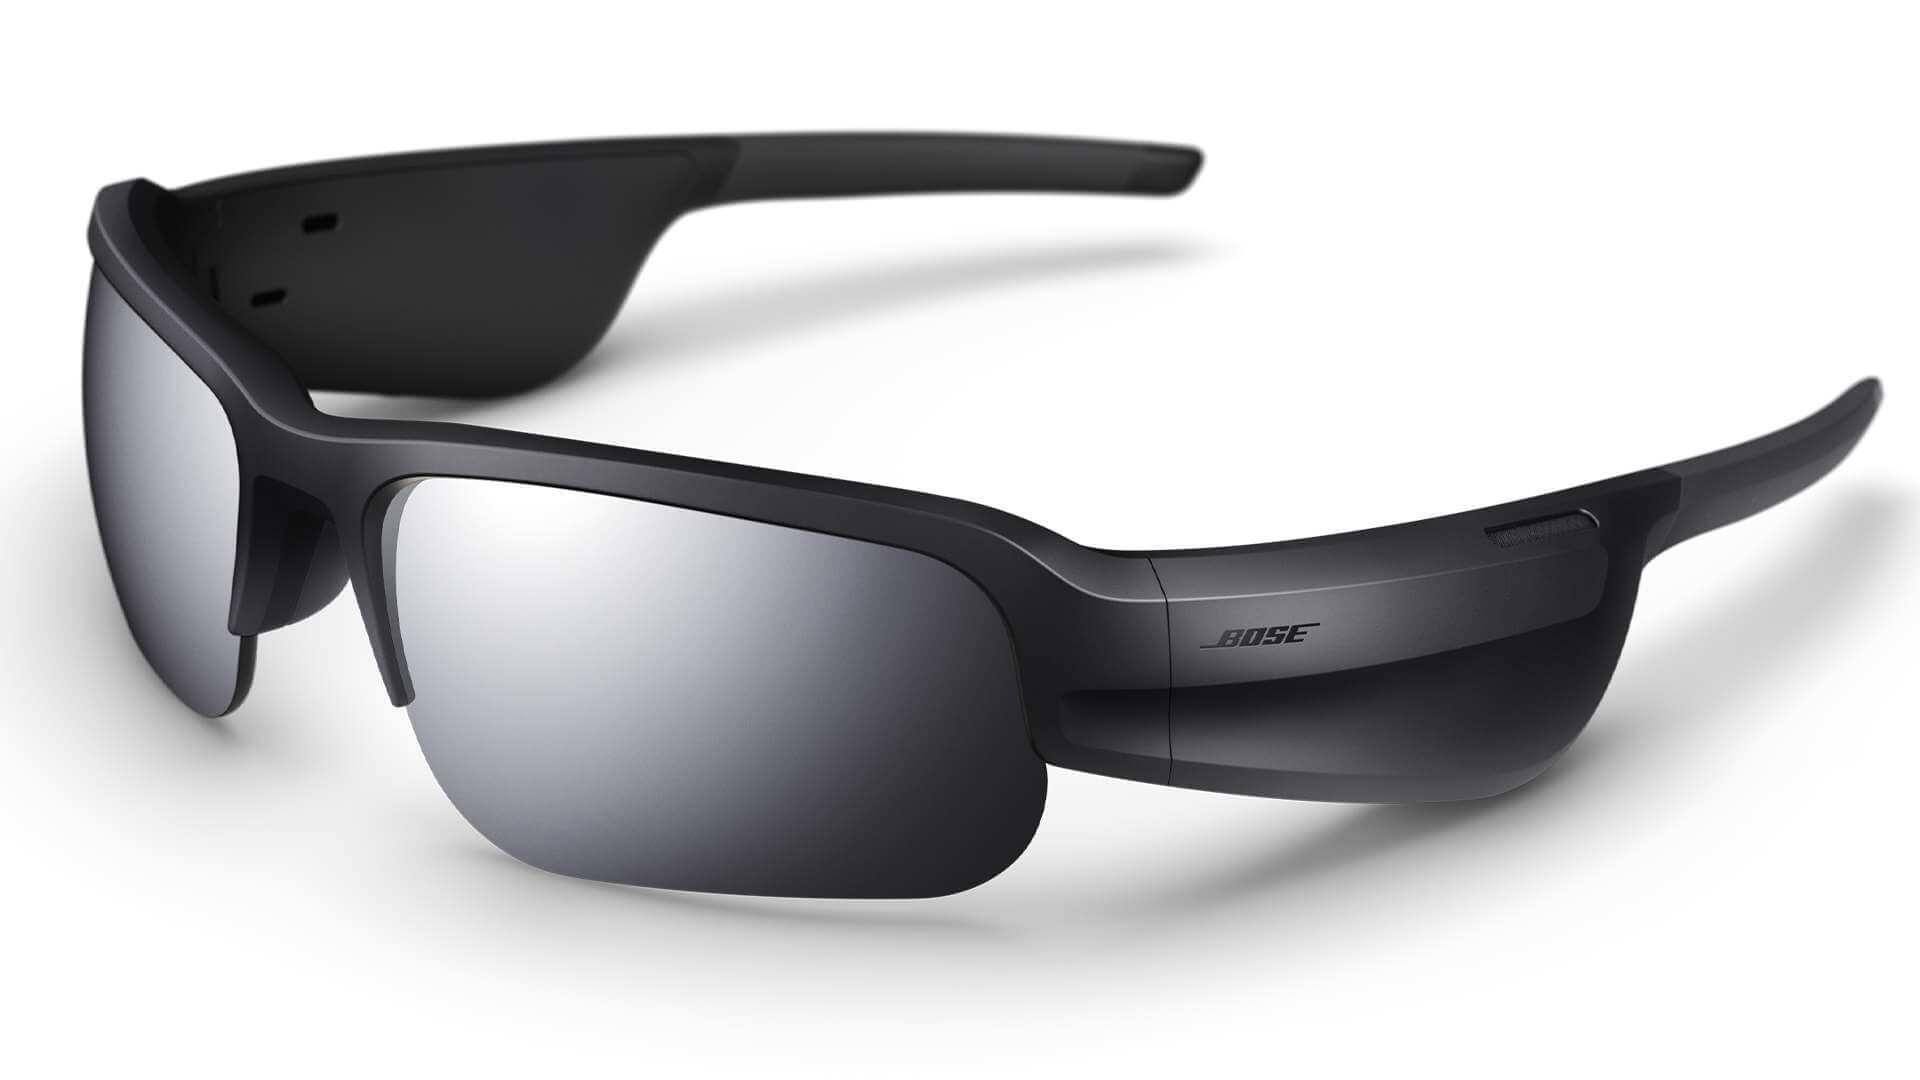 bose frames tempo audio sunglasses speakers built-in